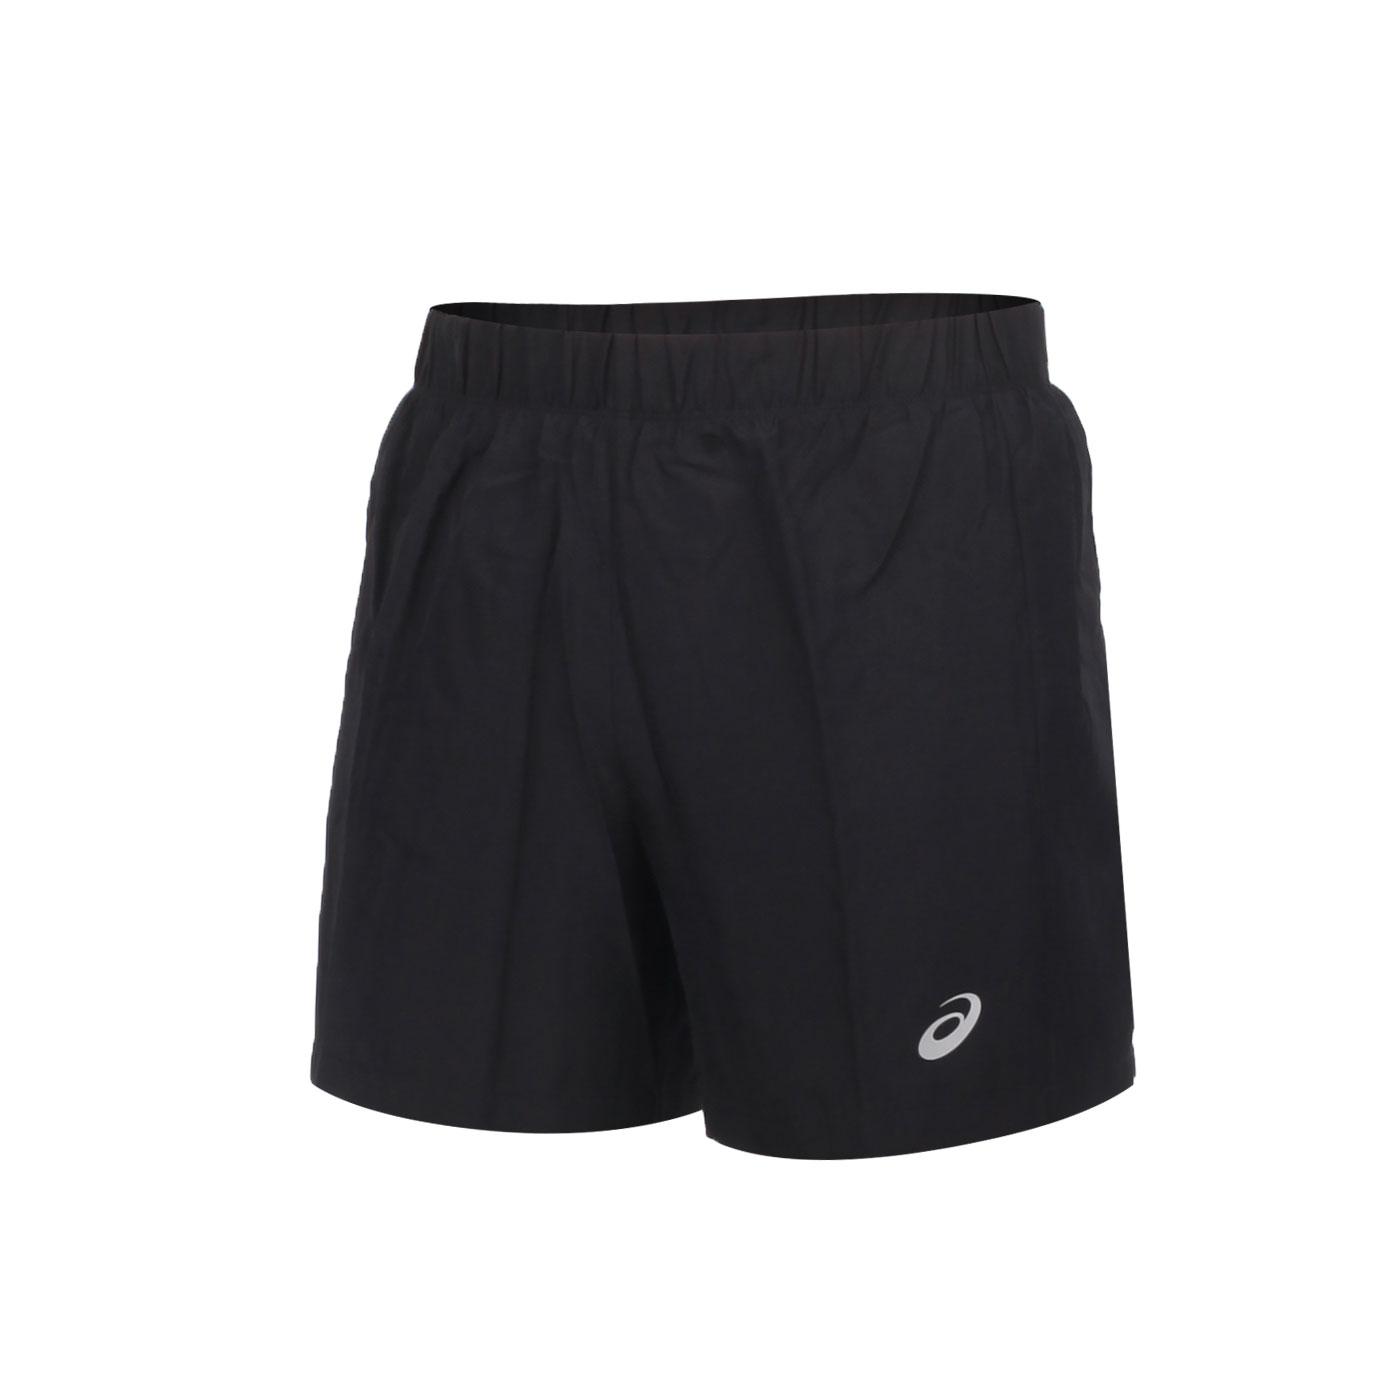 ASICS 男款片假名短褲 2011A952-002